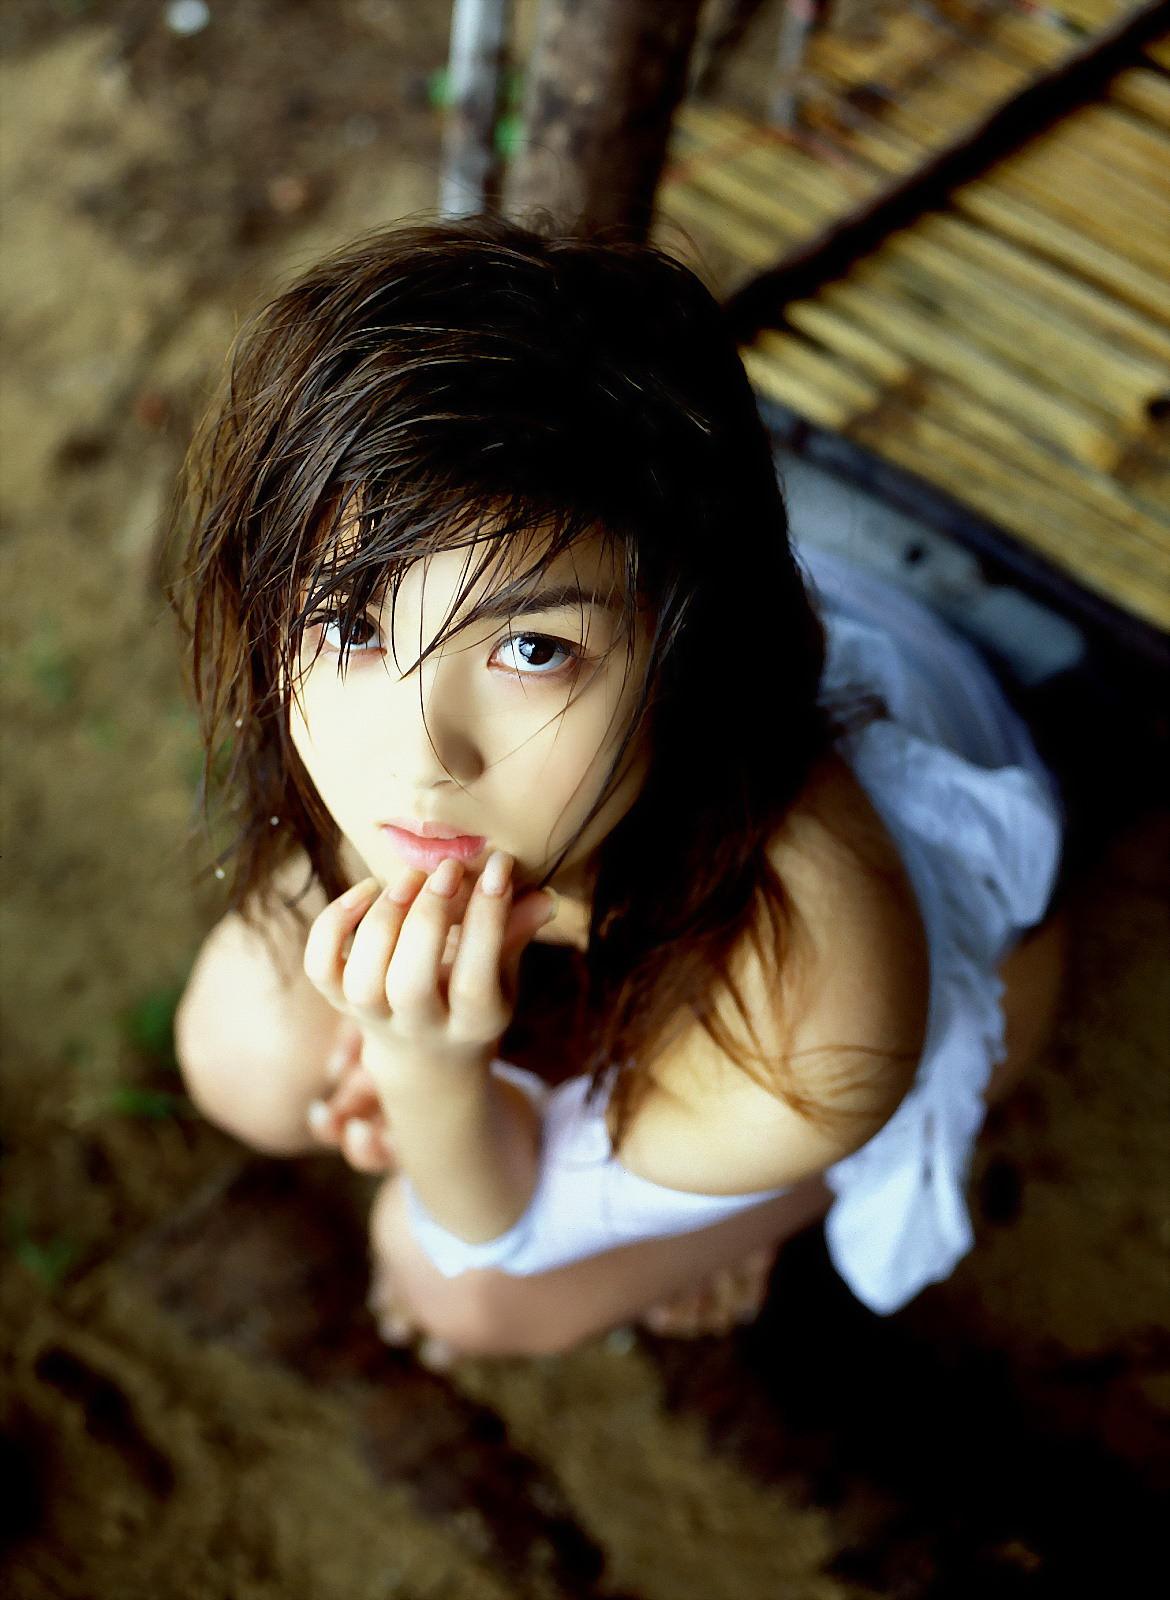 Sayaka Fukuoka Photo Gallery